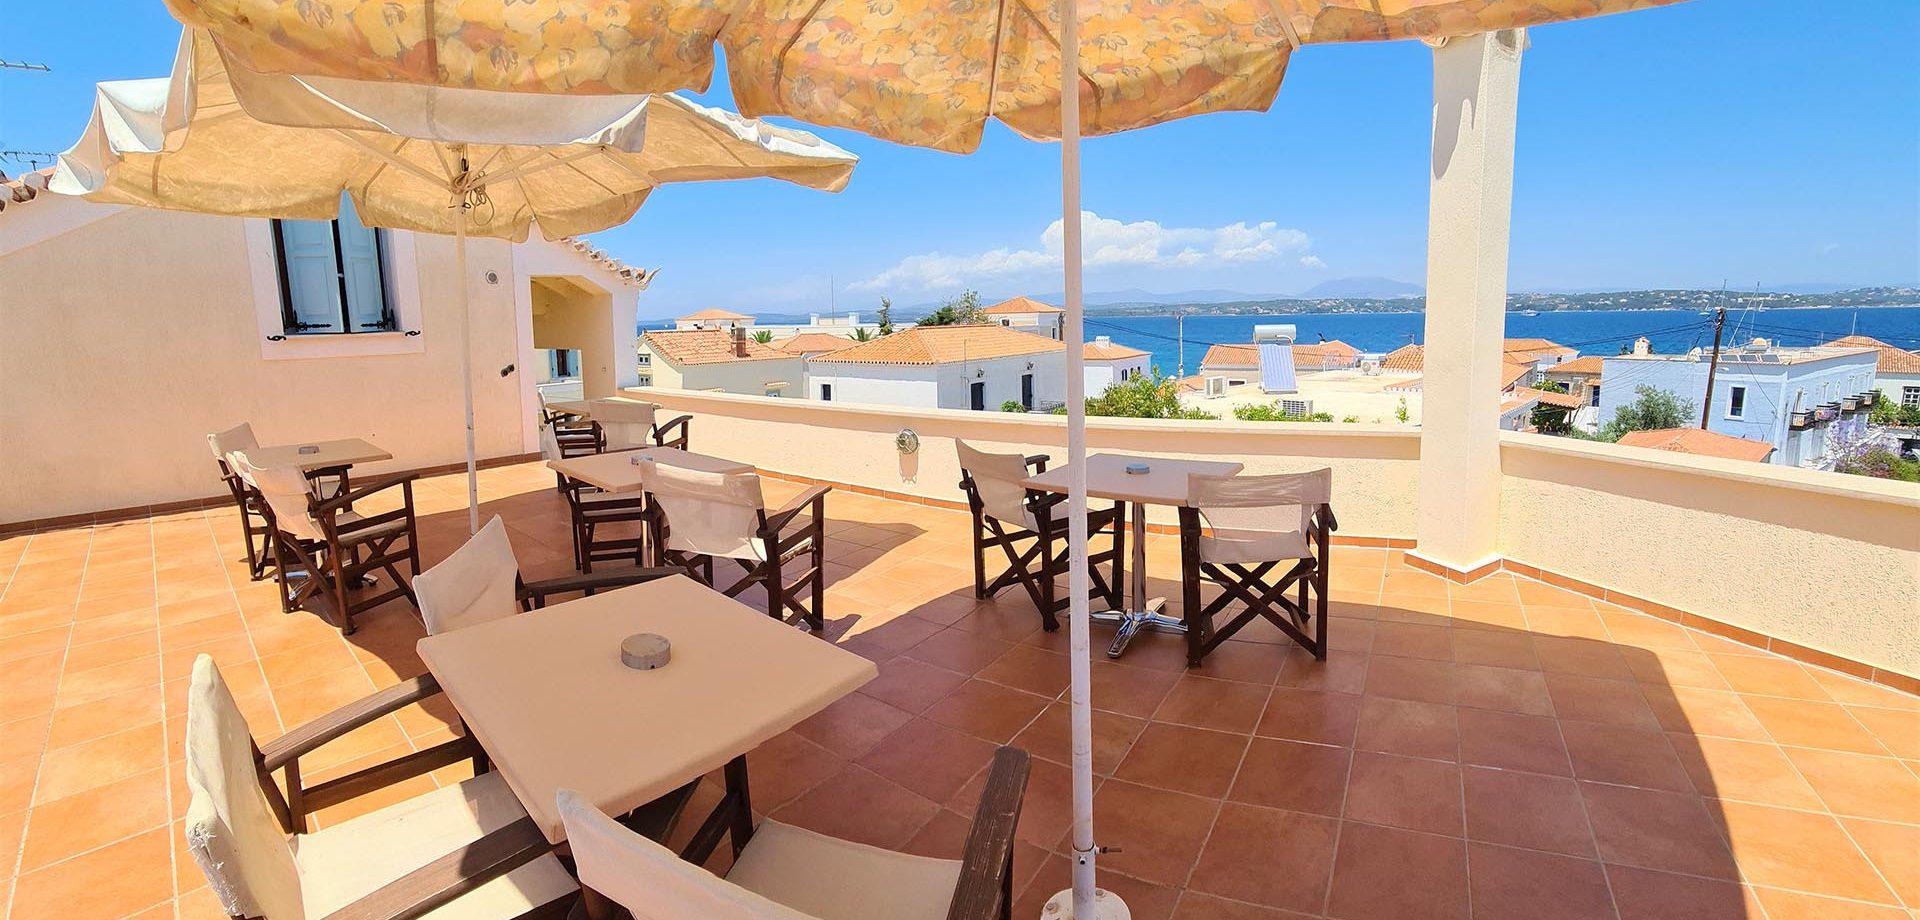 Kastro Hotel Spetses